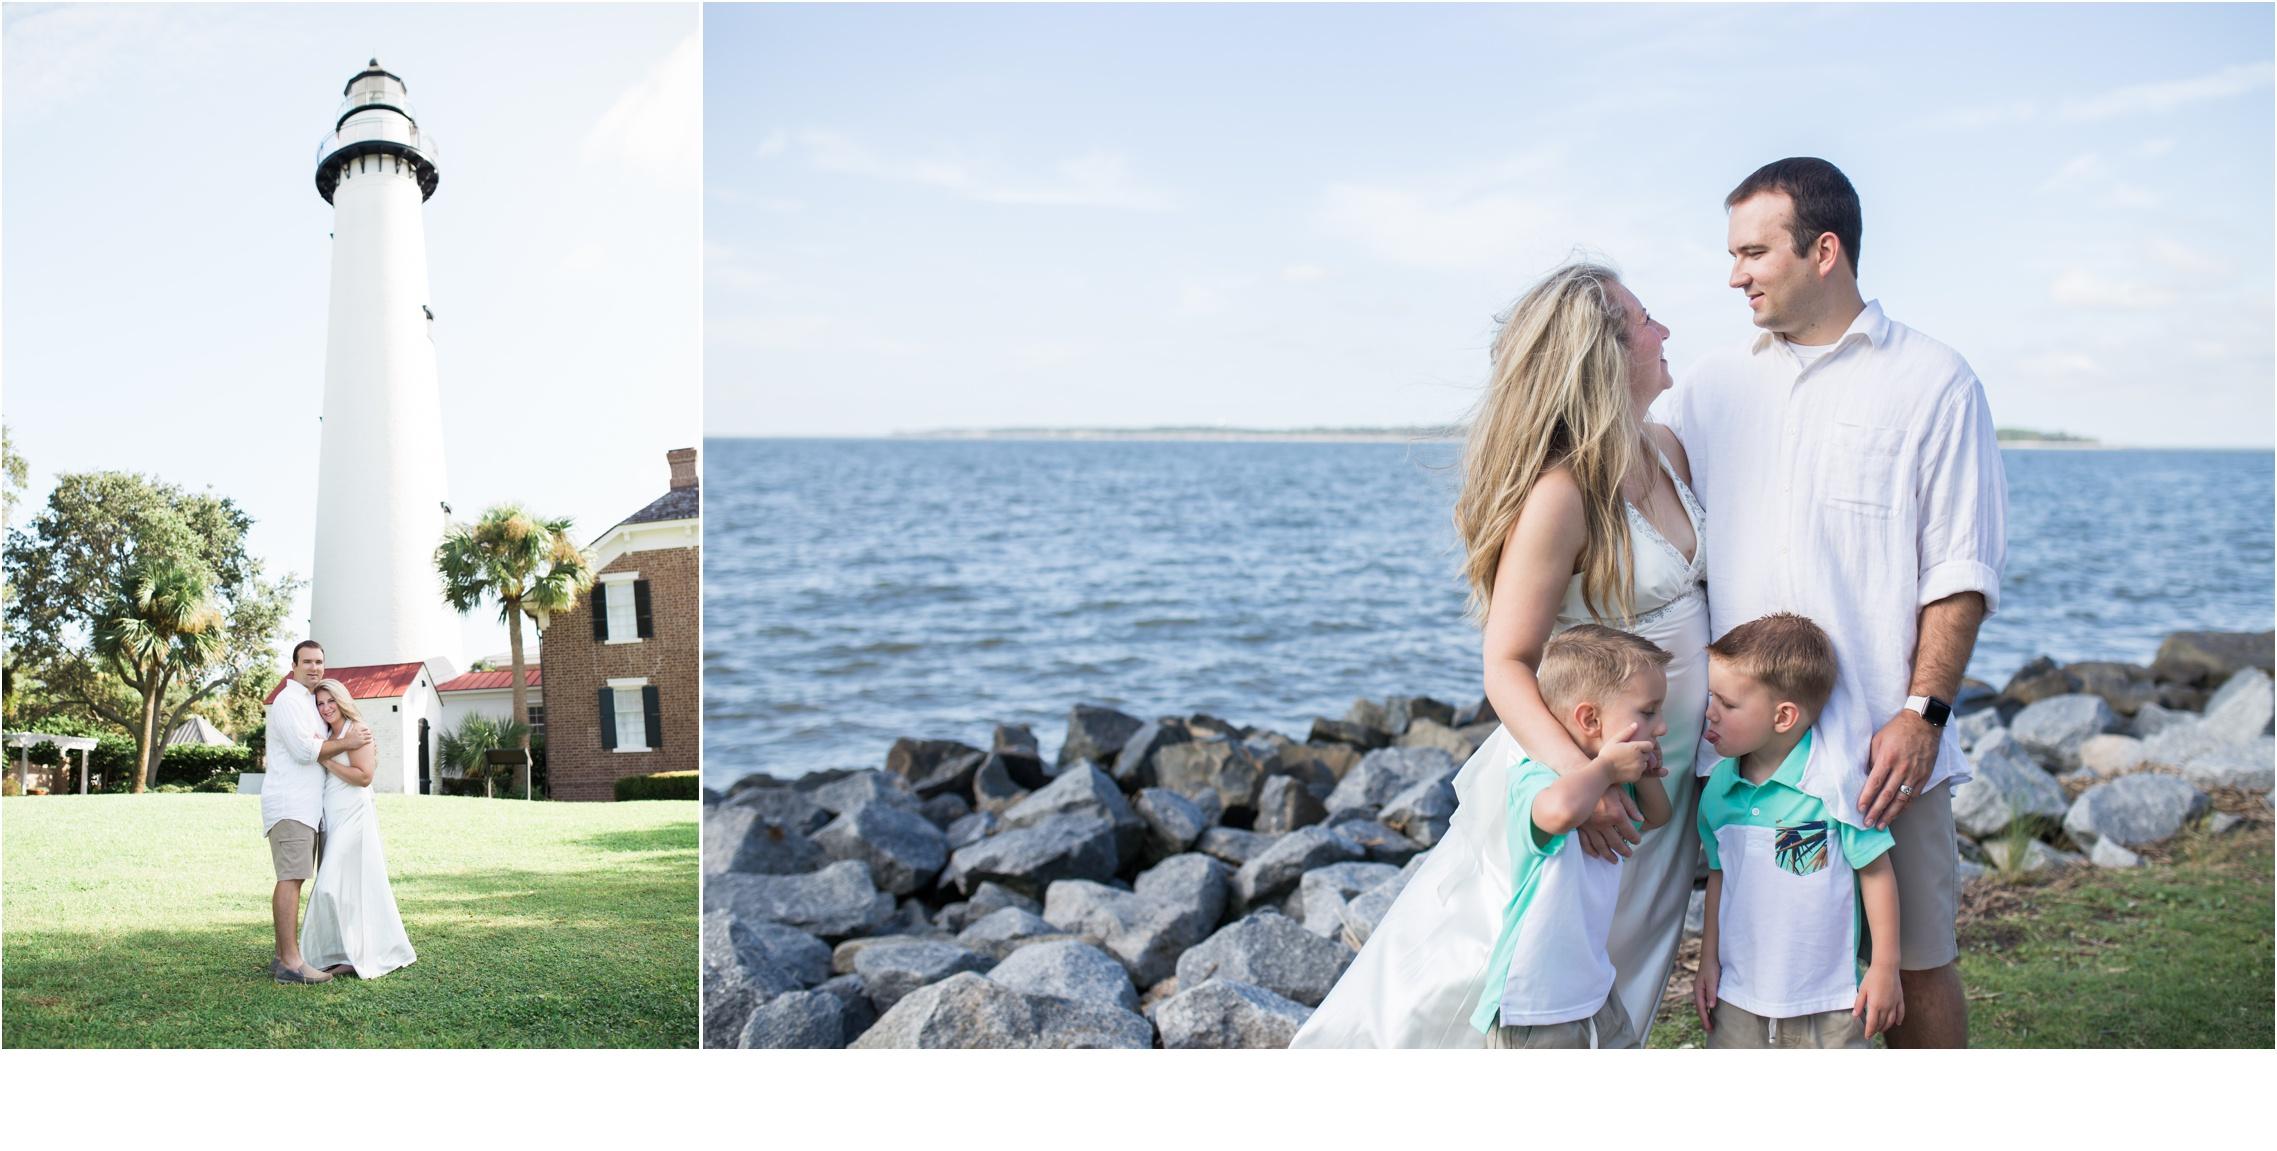 Rainey_Gregg_Photography_St._Simons_Island_Georgia_California_Wedding_Portrait_Photography_0132.jpg